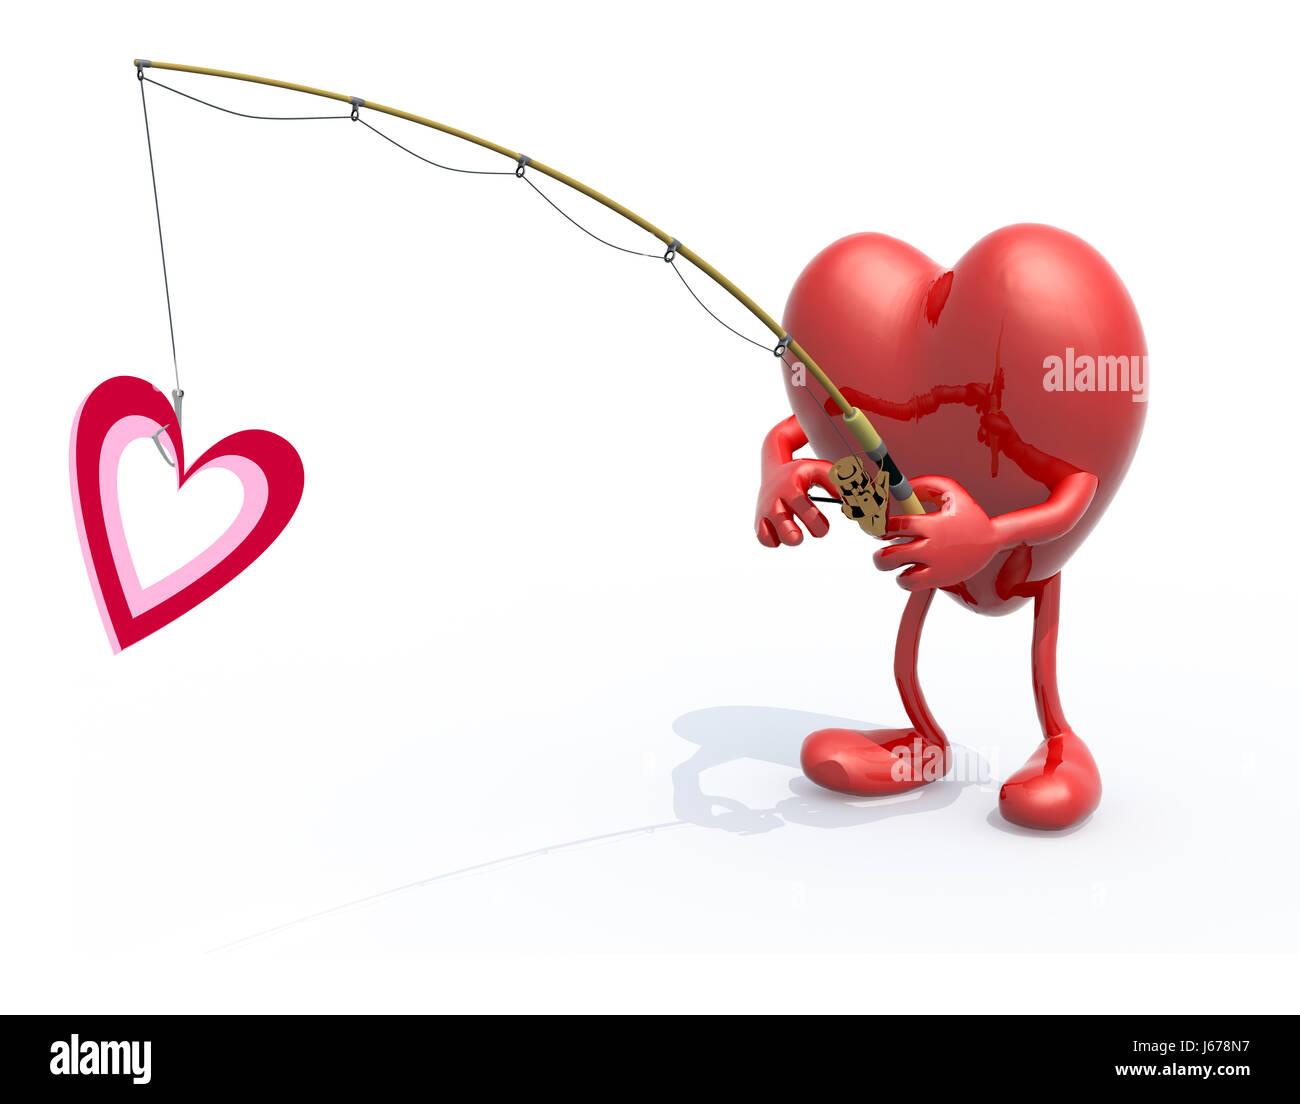 Big heart with arms legs fishing pole on hand fishing a heart big heart with arms legs fishing pole on hand fishing a heart symbol 3d illustration buycottarizona Image collections